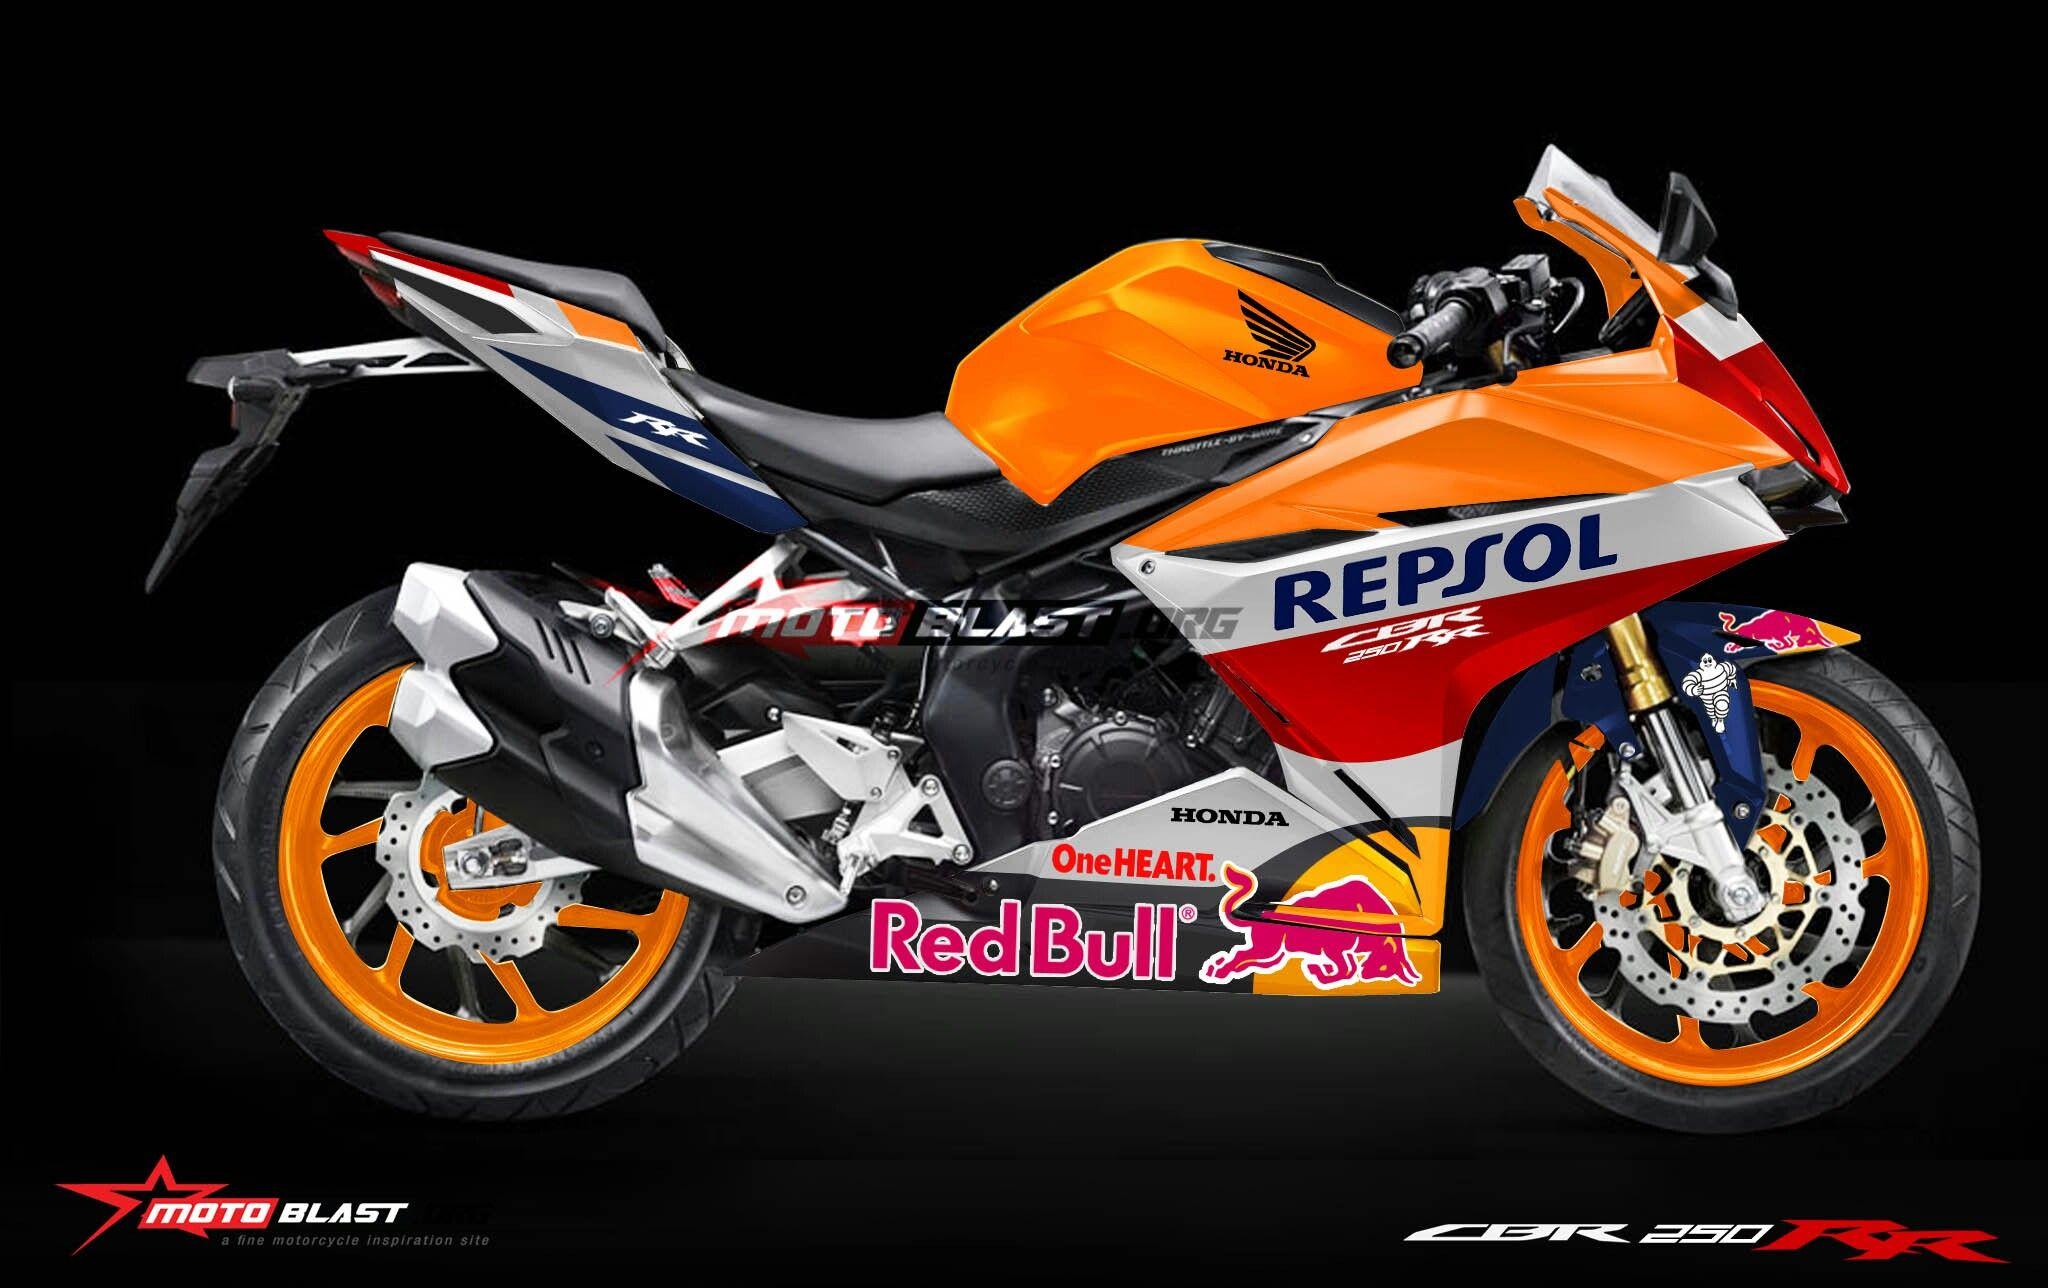 16 Honda Cbr250rr Repsol Edition スクーター バイク